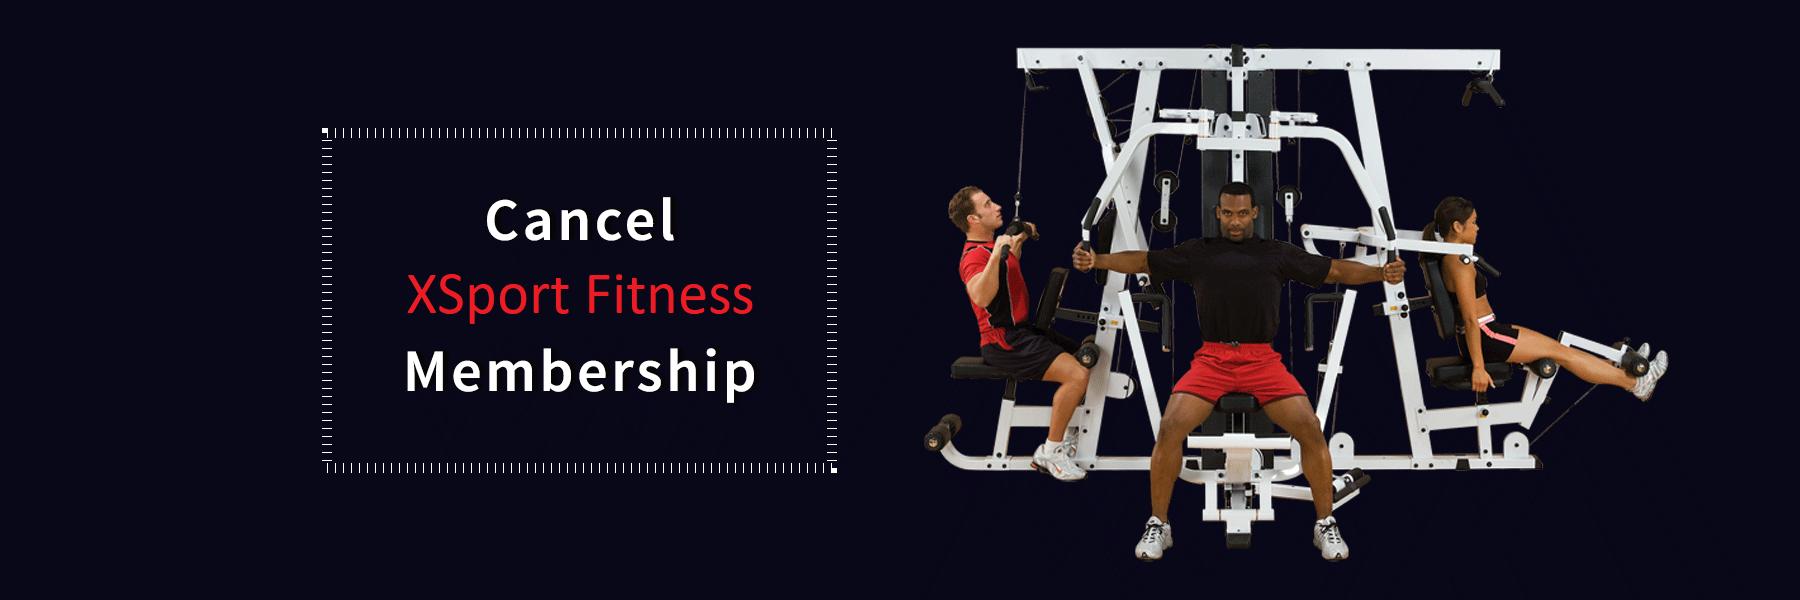 Cancel-XSport-Fitness-Membership